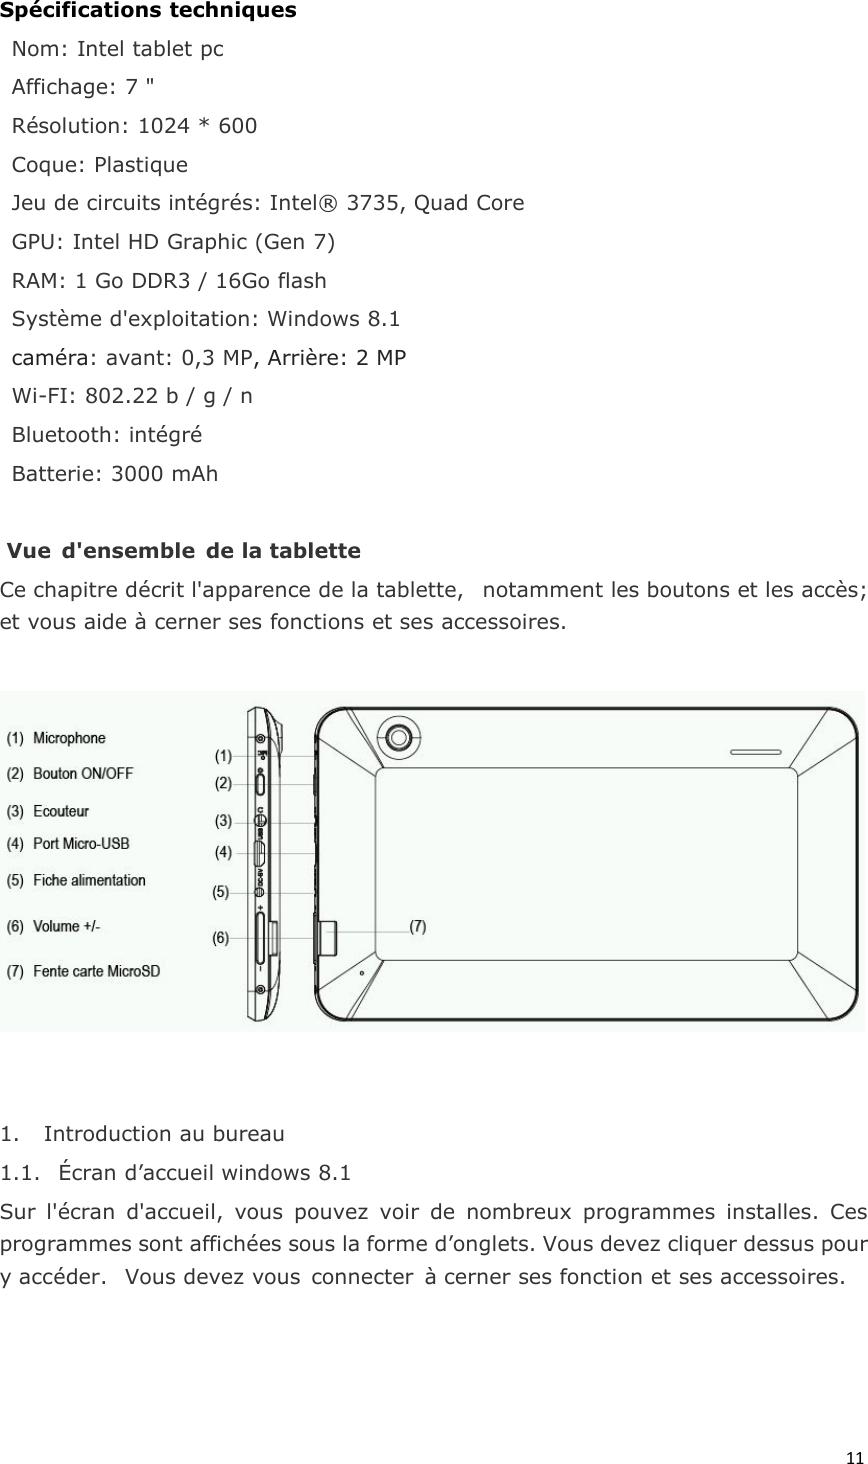 Lenoge Technology TU-W7982 Tablet PC User Manual Manual